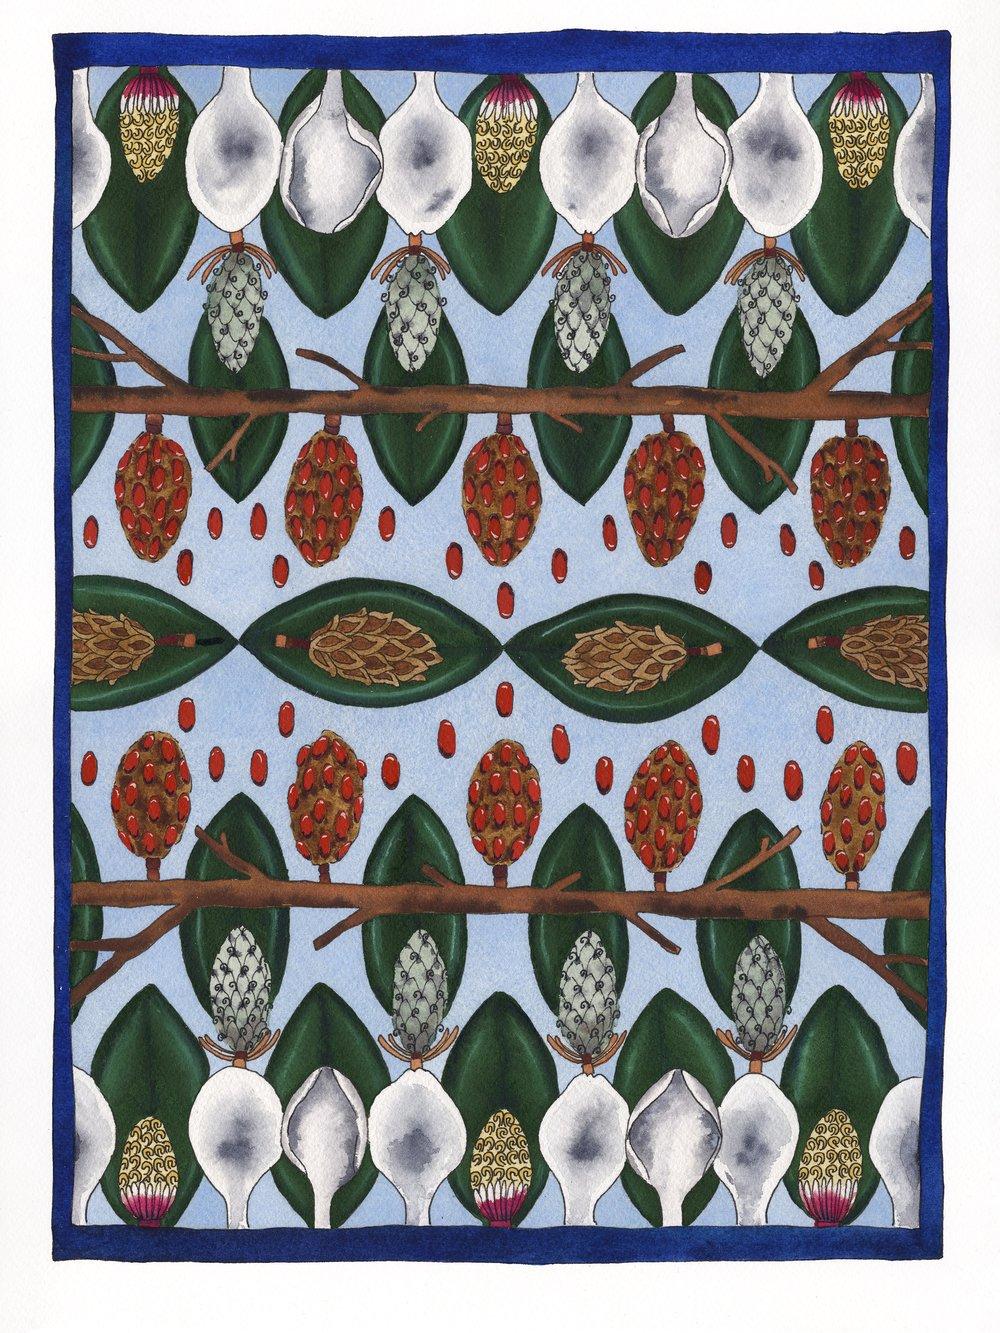 Magnolia Tapestry Life Cycle Emma Fick Art